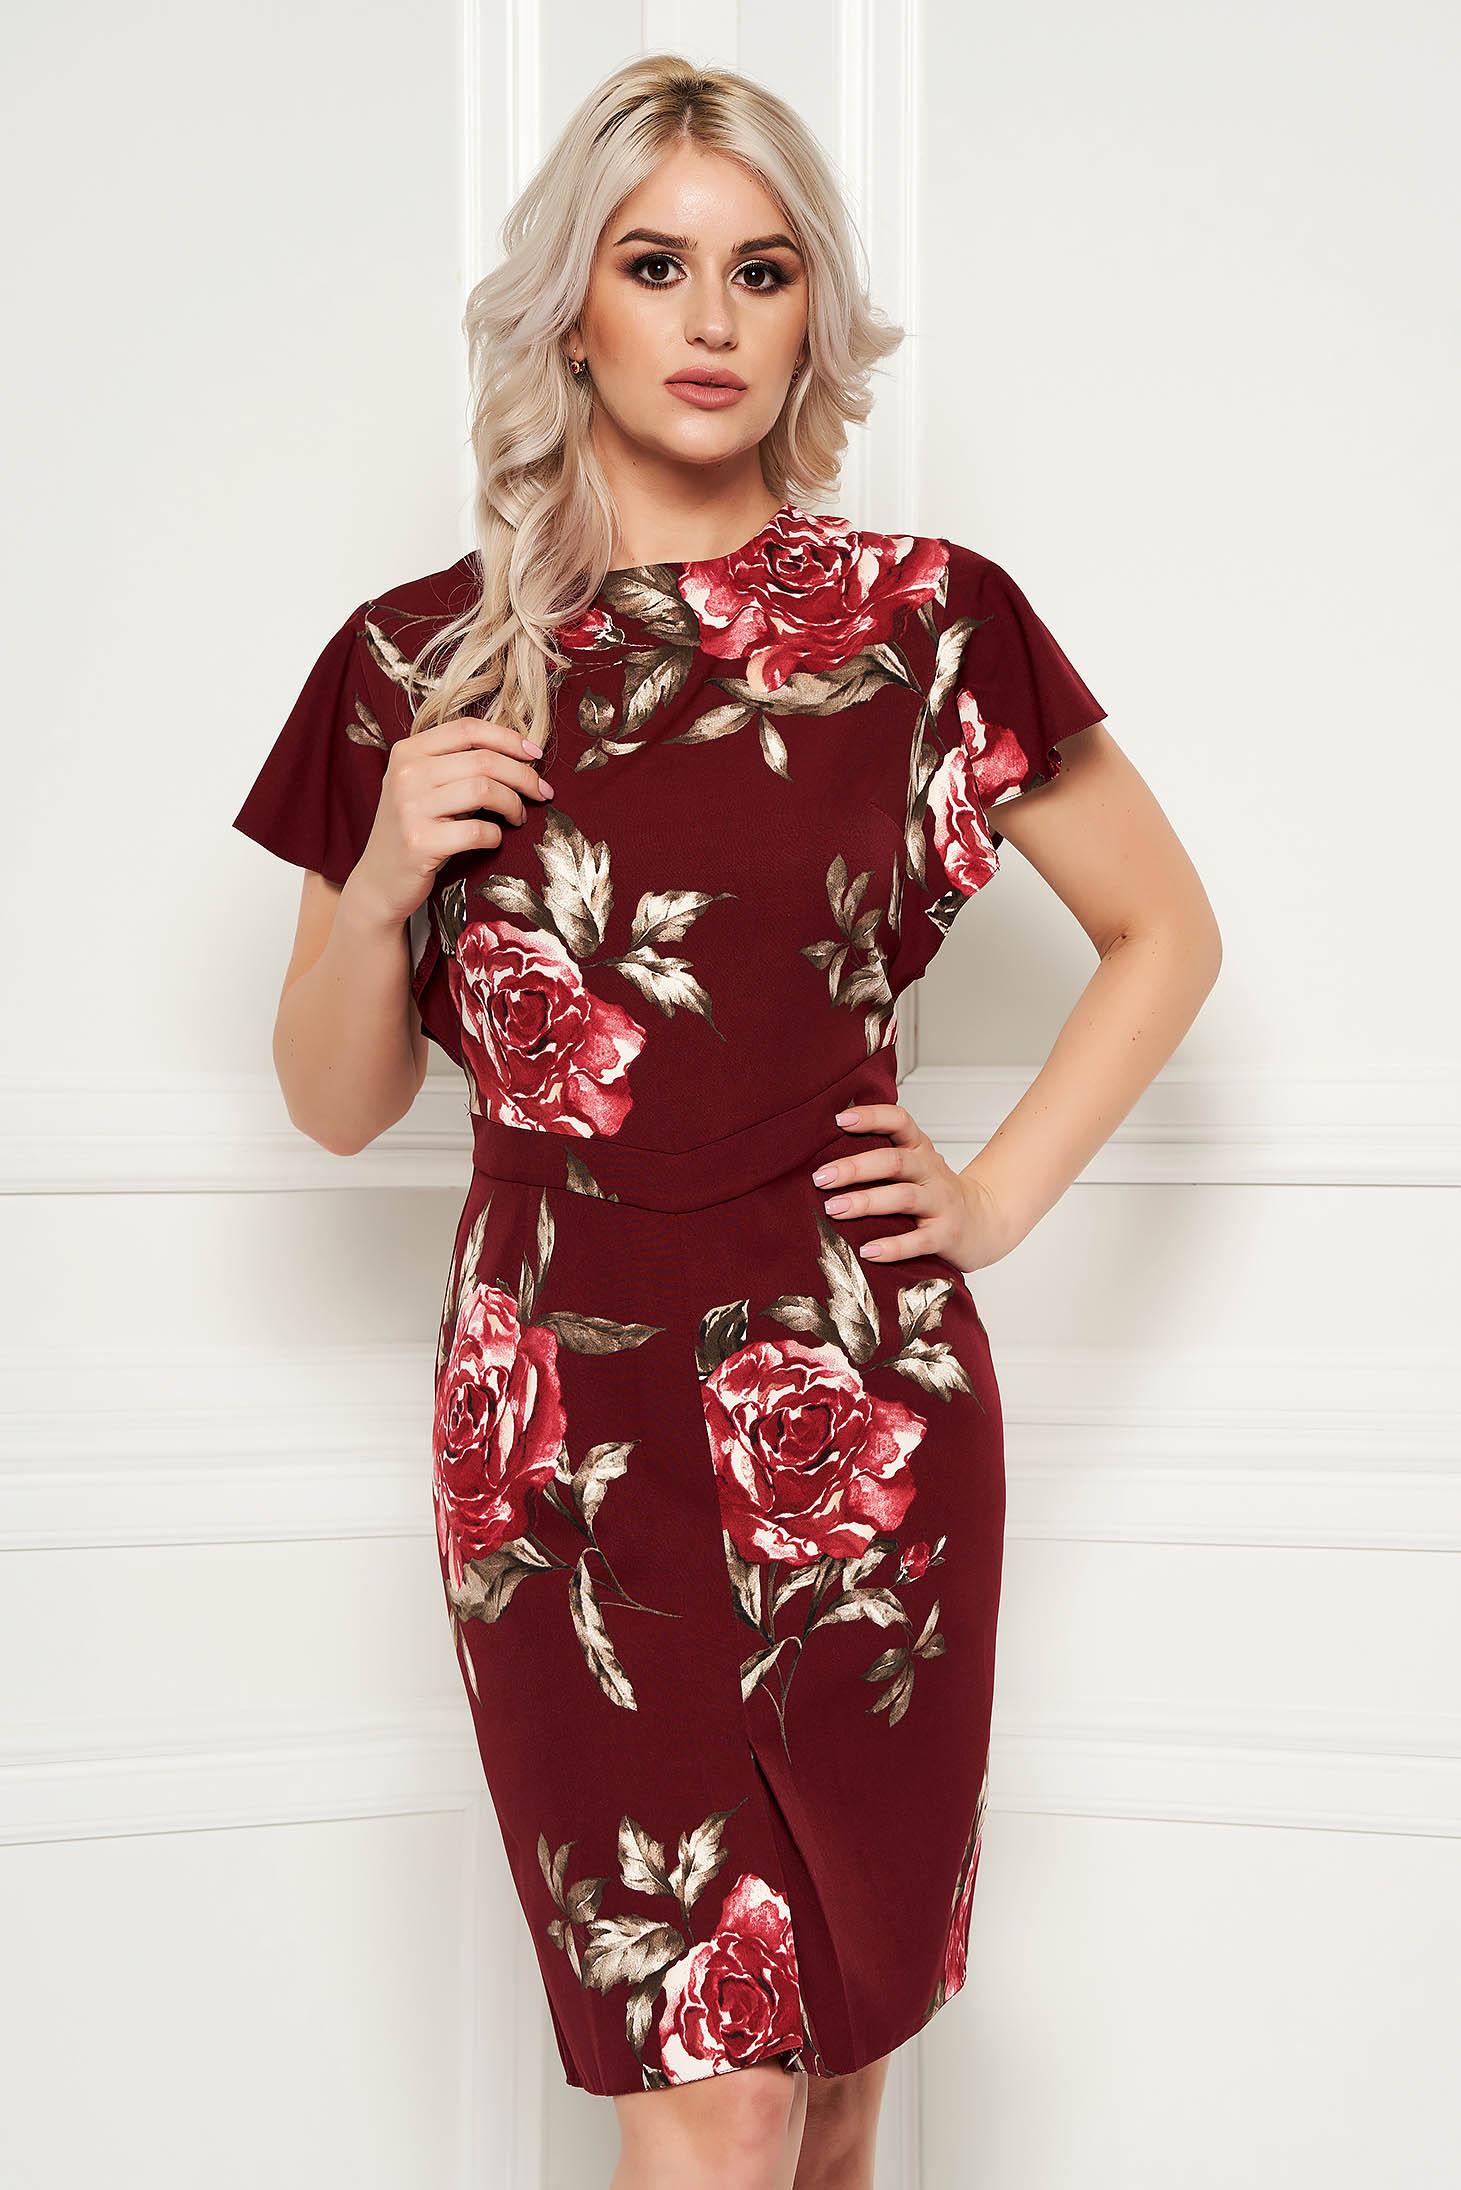 b3be5496020e6 Burgundy elegant pencil dress short sleeve soft fabric with floral prints